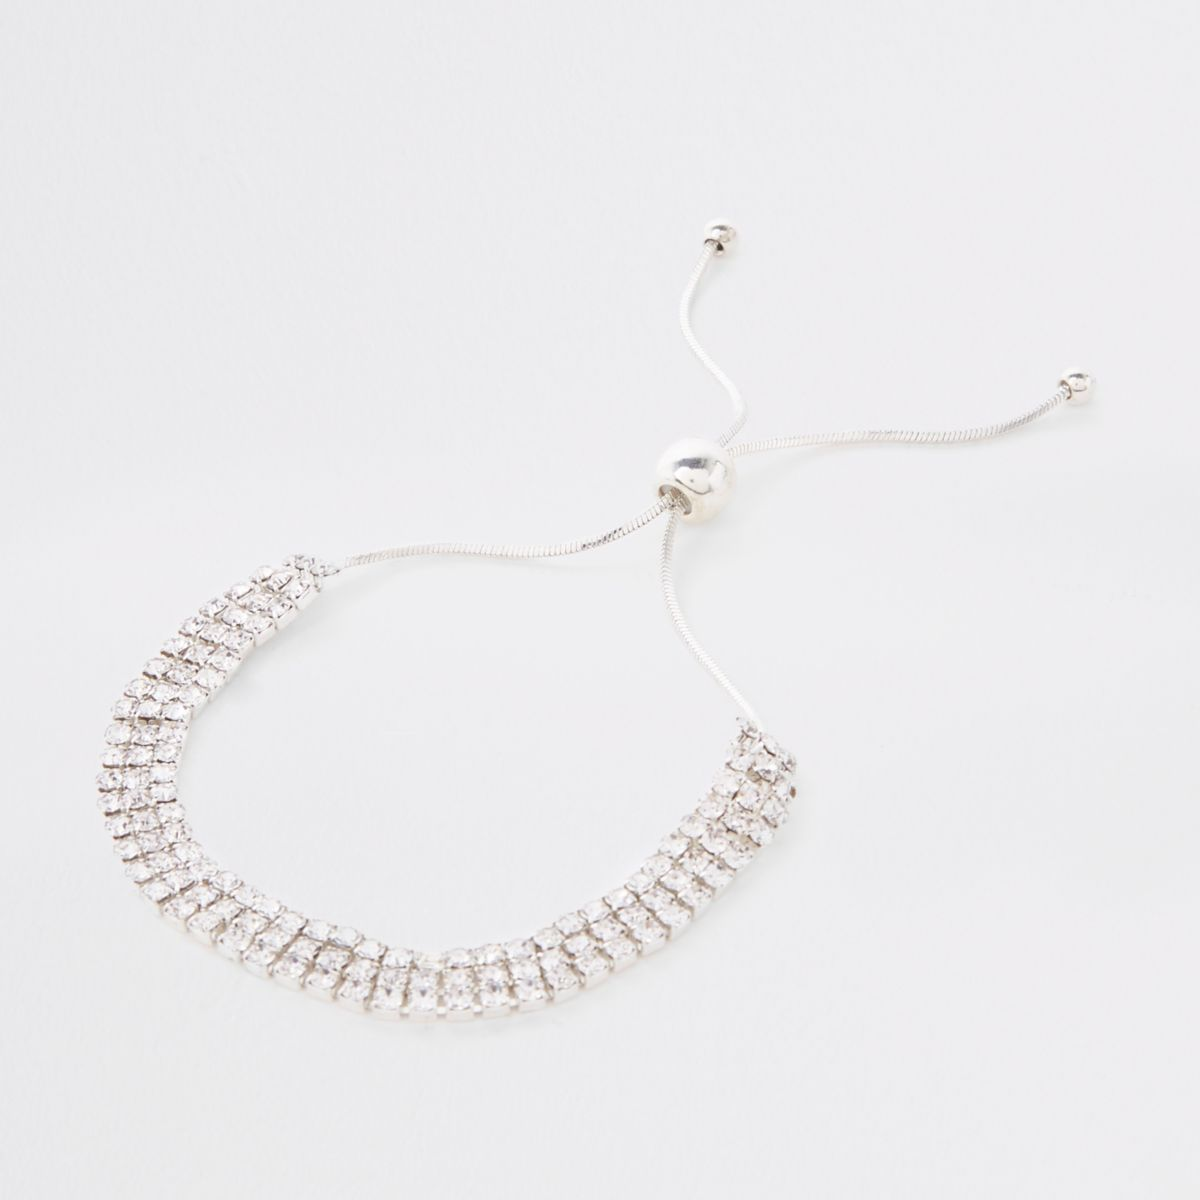 Silver rhinestone encrusted lariat bracelet